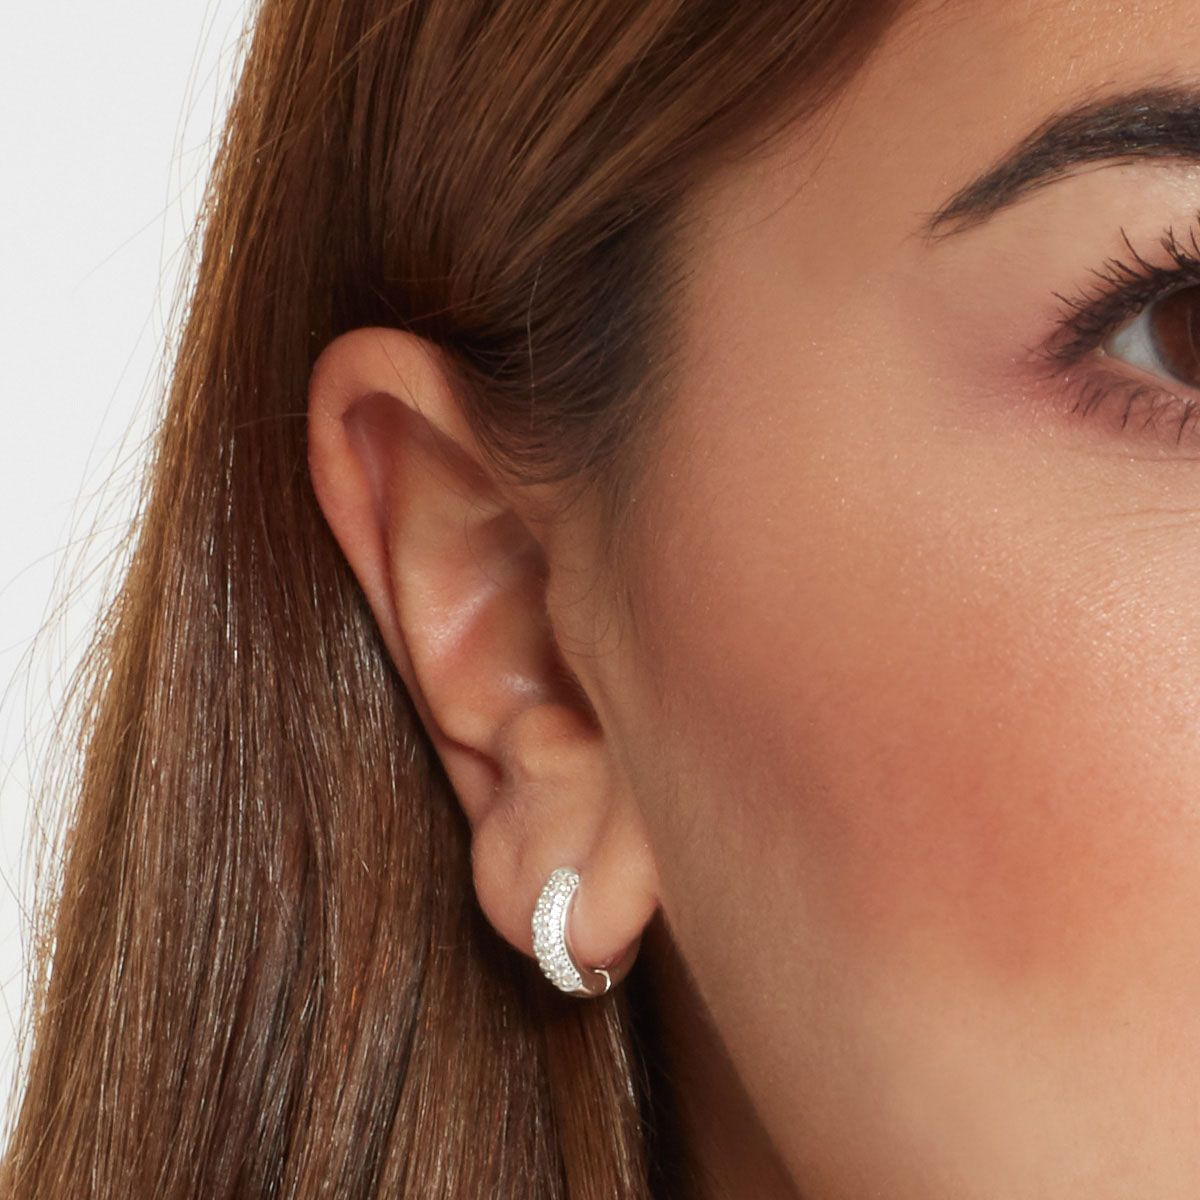 Bonnie Piercing - Ohrring Anhänger - Silber